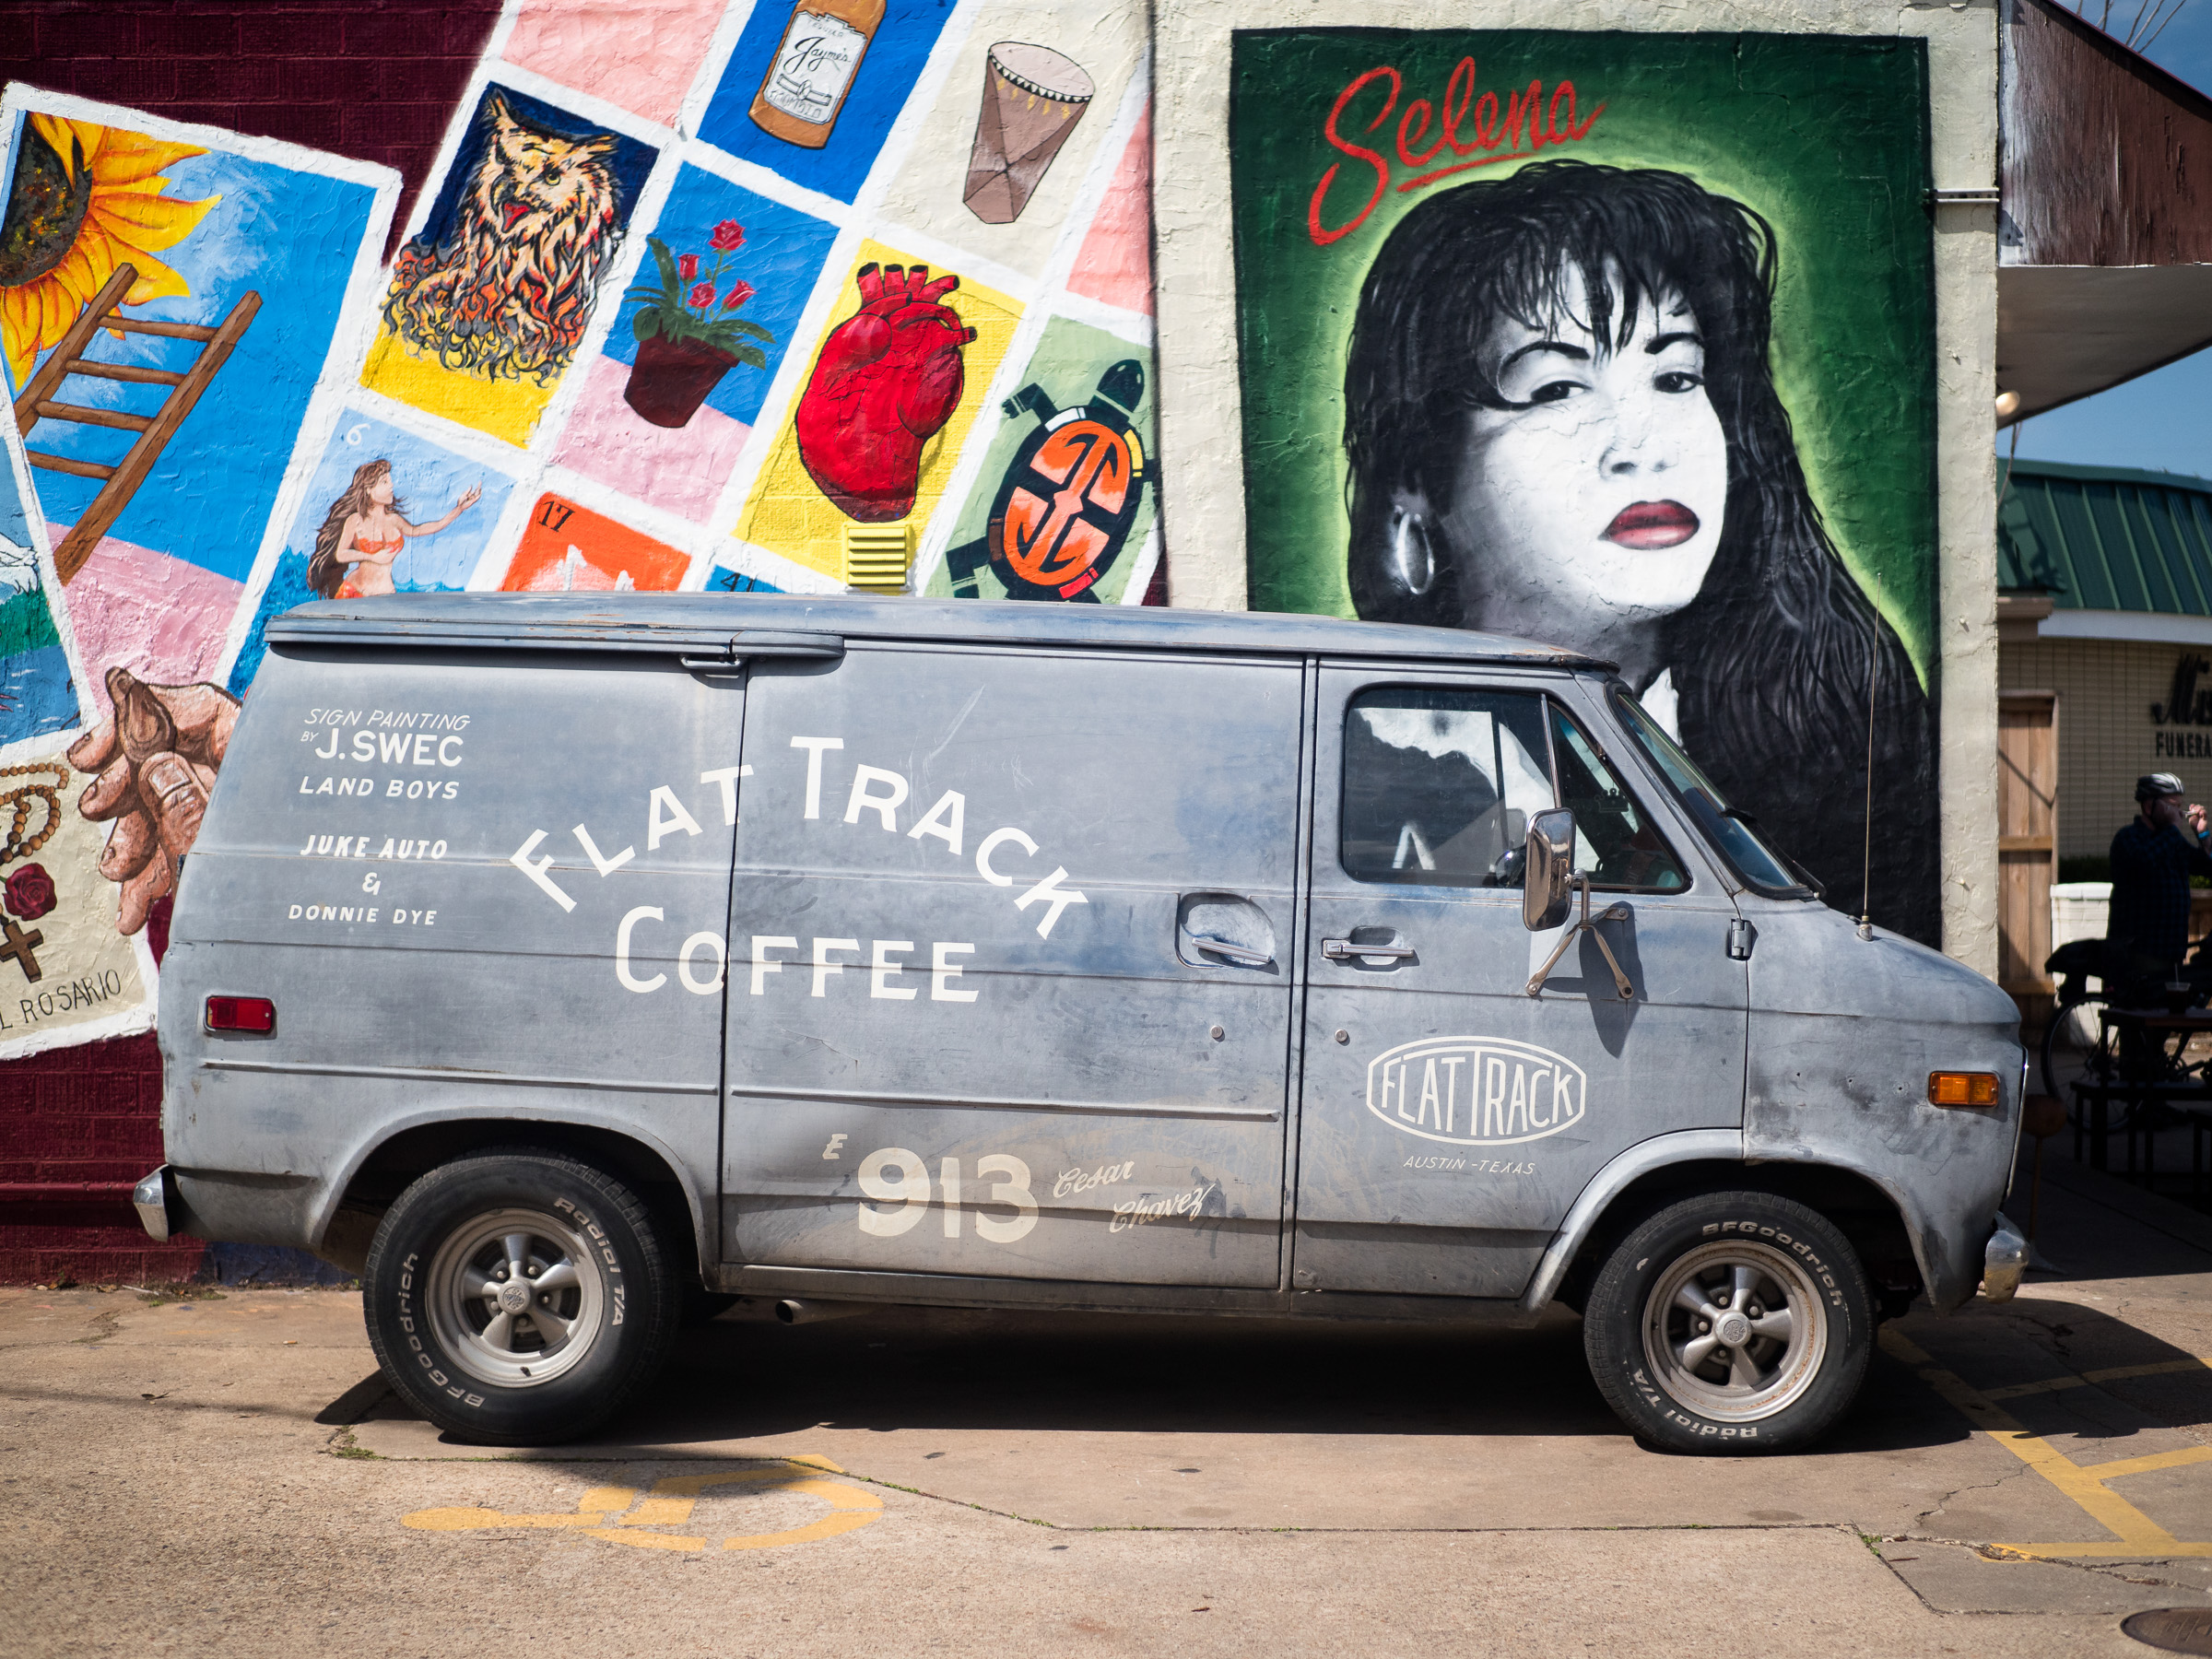 travel channel austin texas food photographer portland oregon flat track